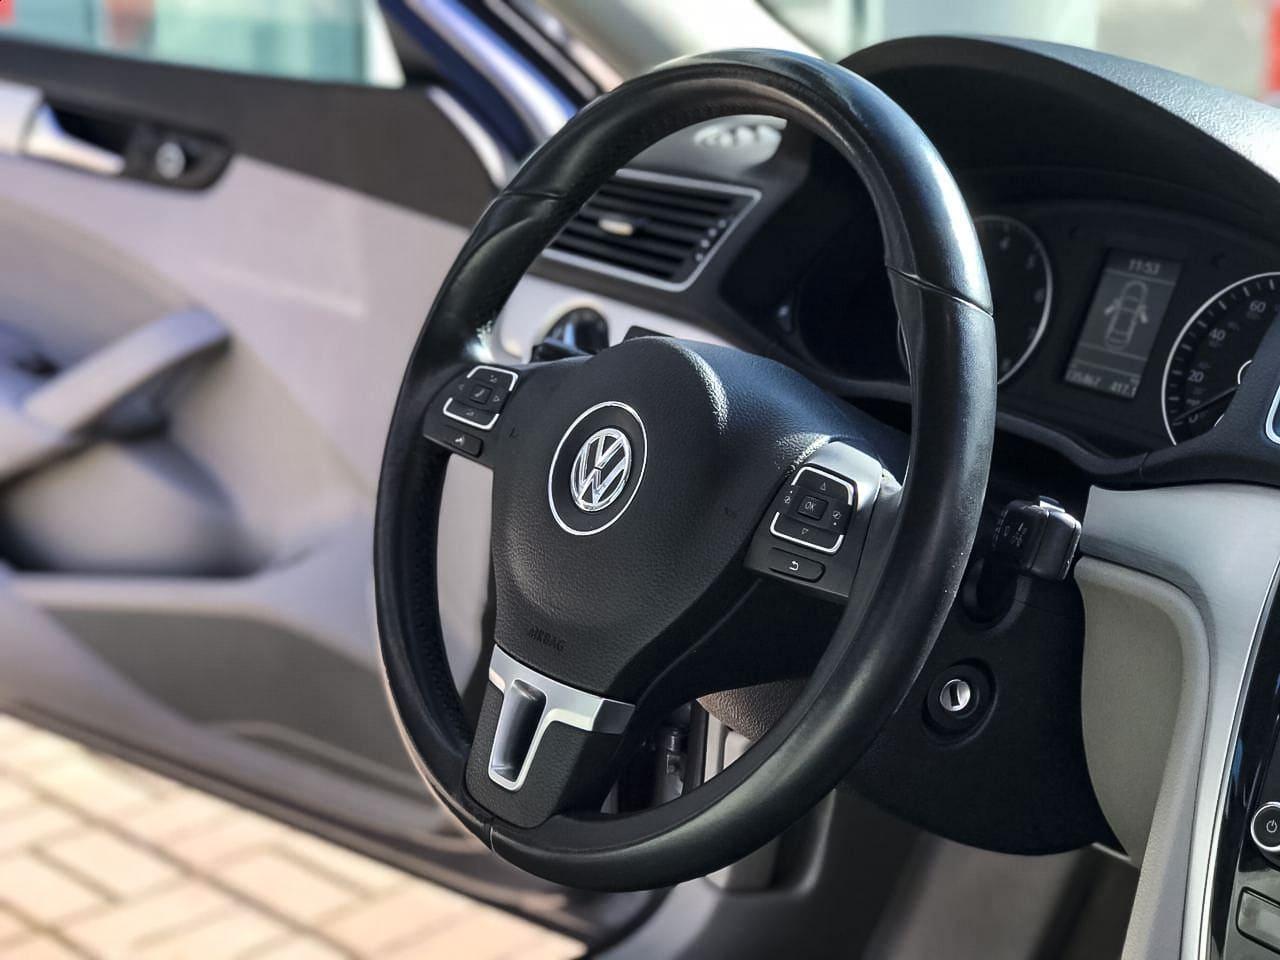 2012 Volkswagen PASSAT   Vin: 1VWBP7A37CC073209